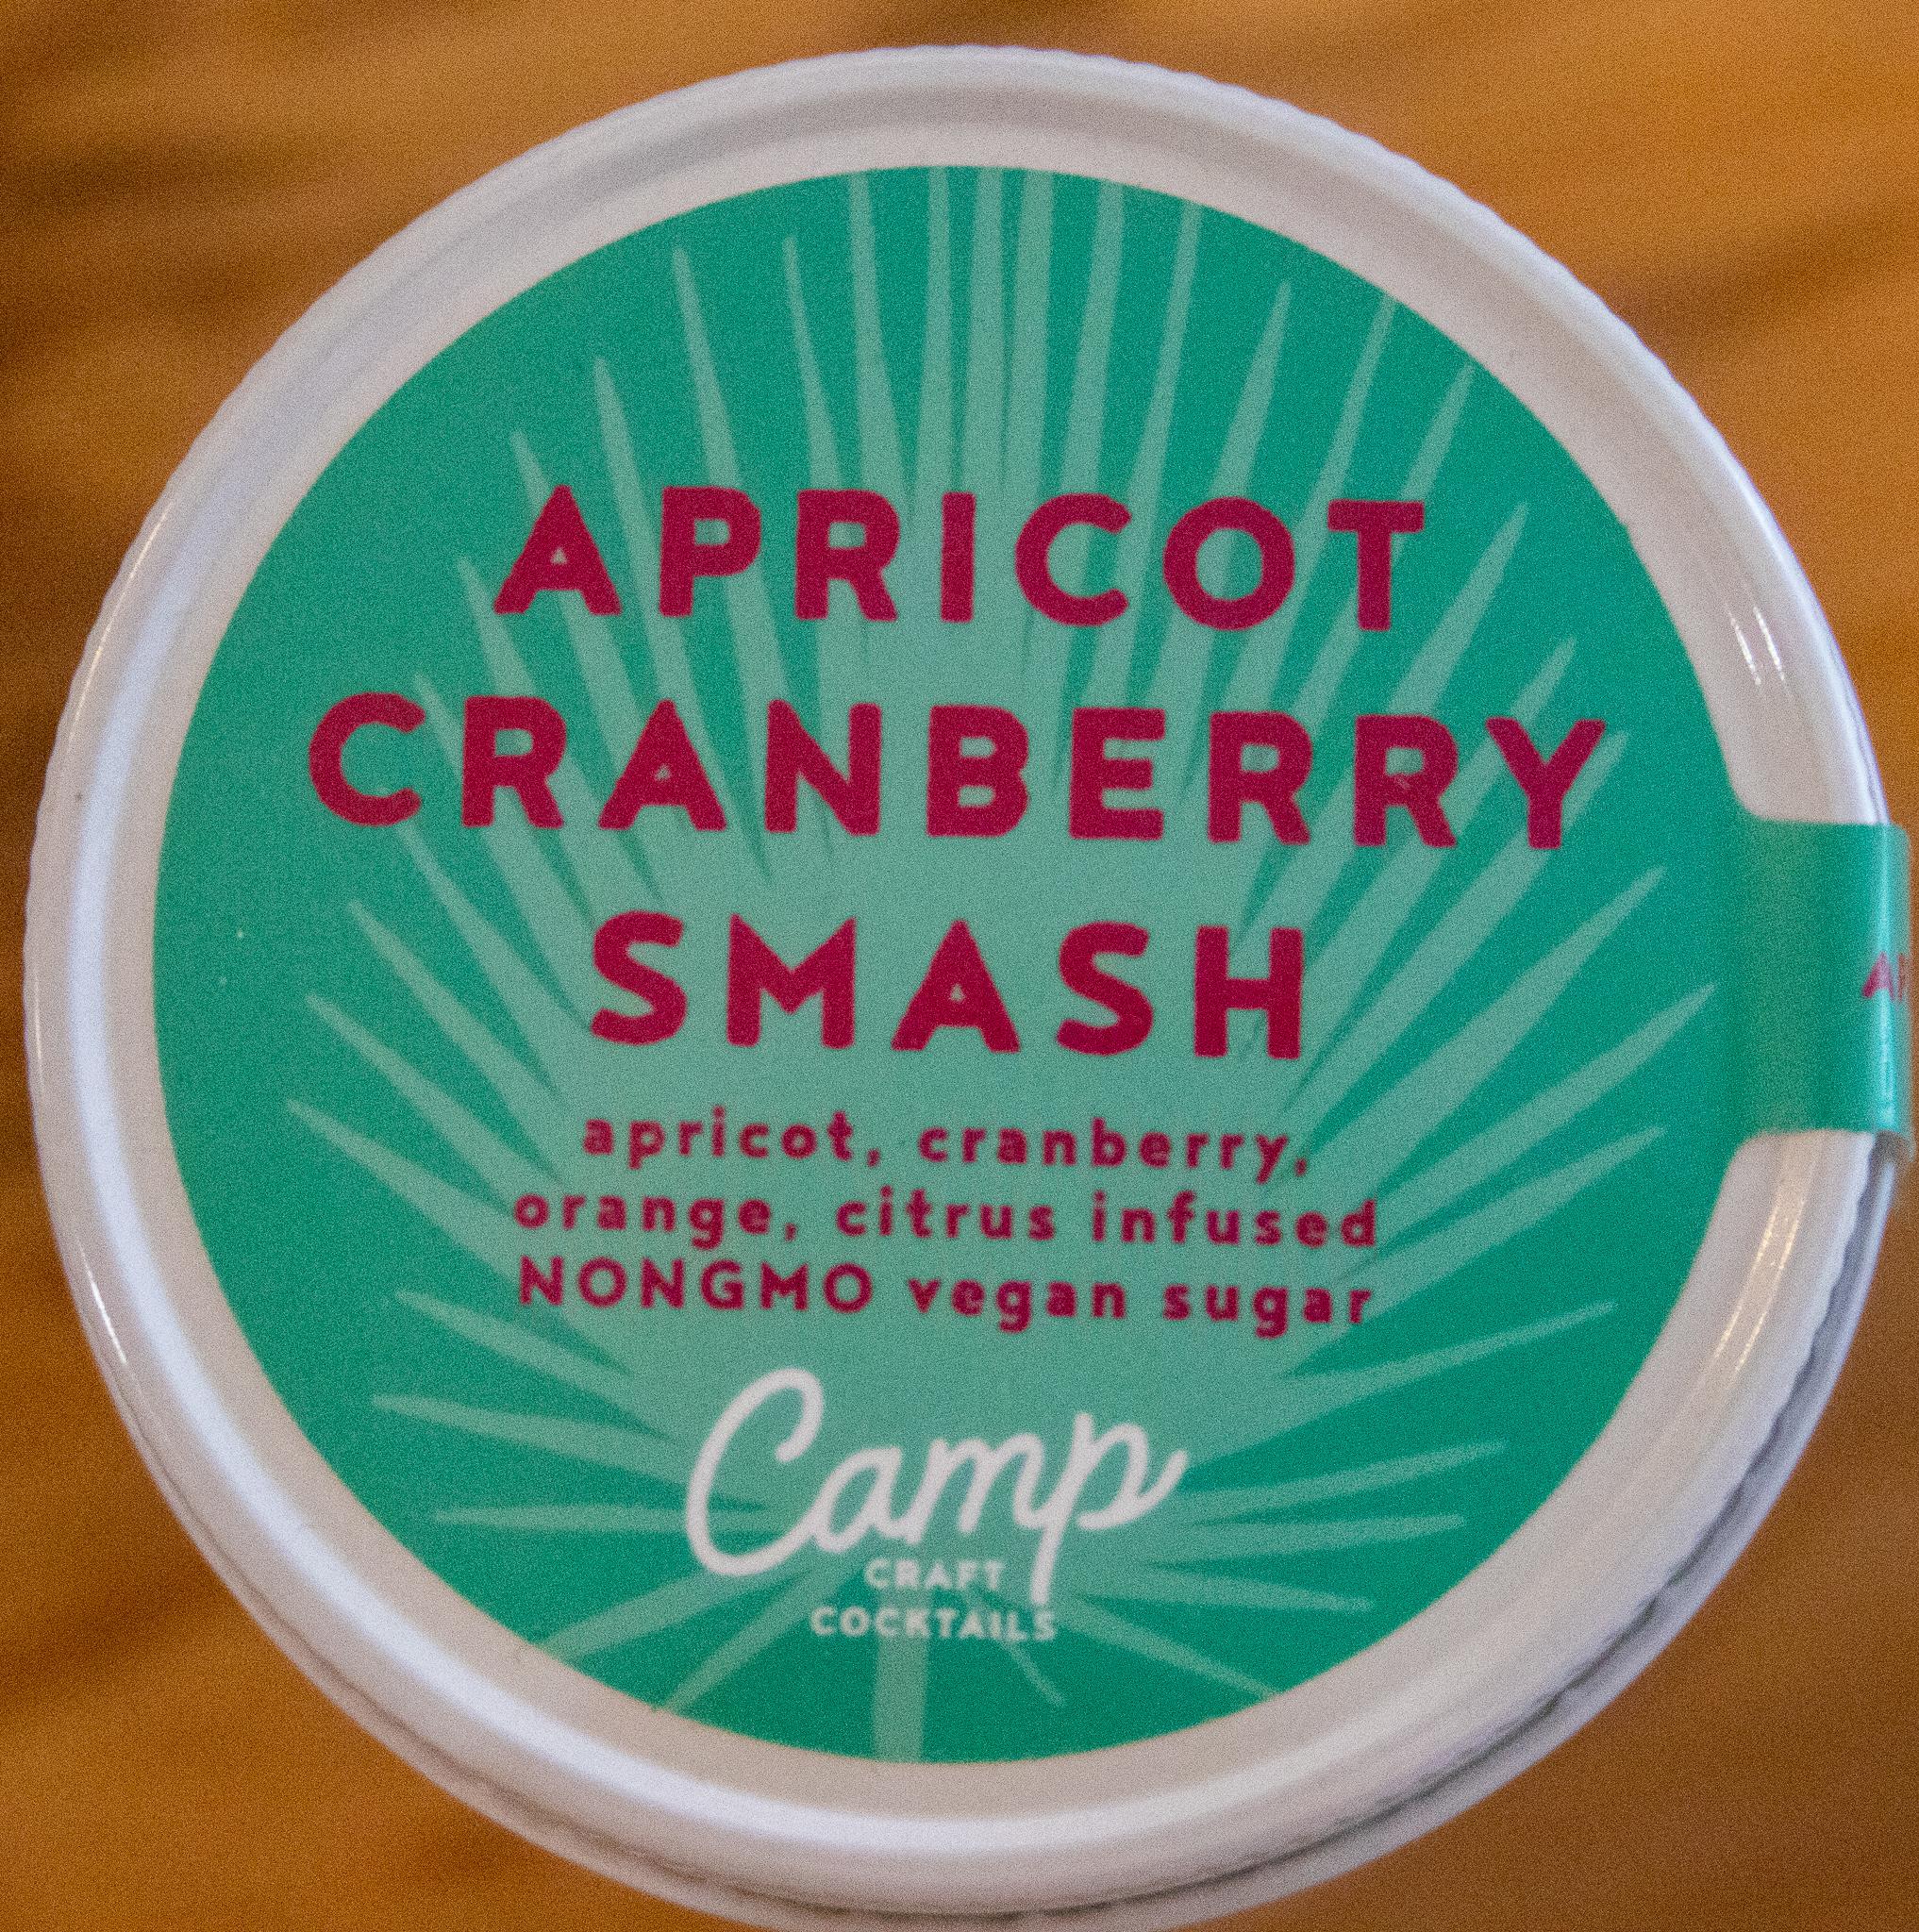 Camp Craft Cocktails Apricot Cranberry Smash